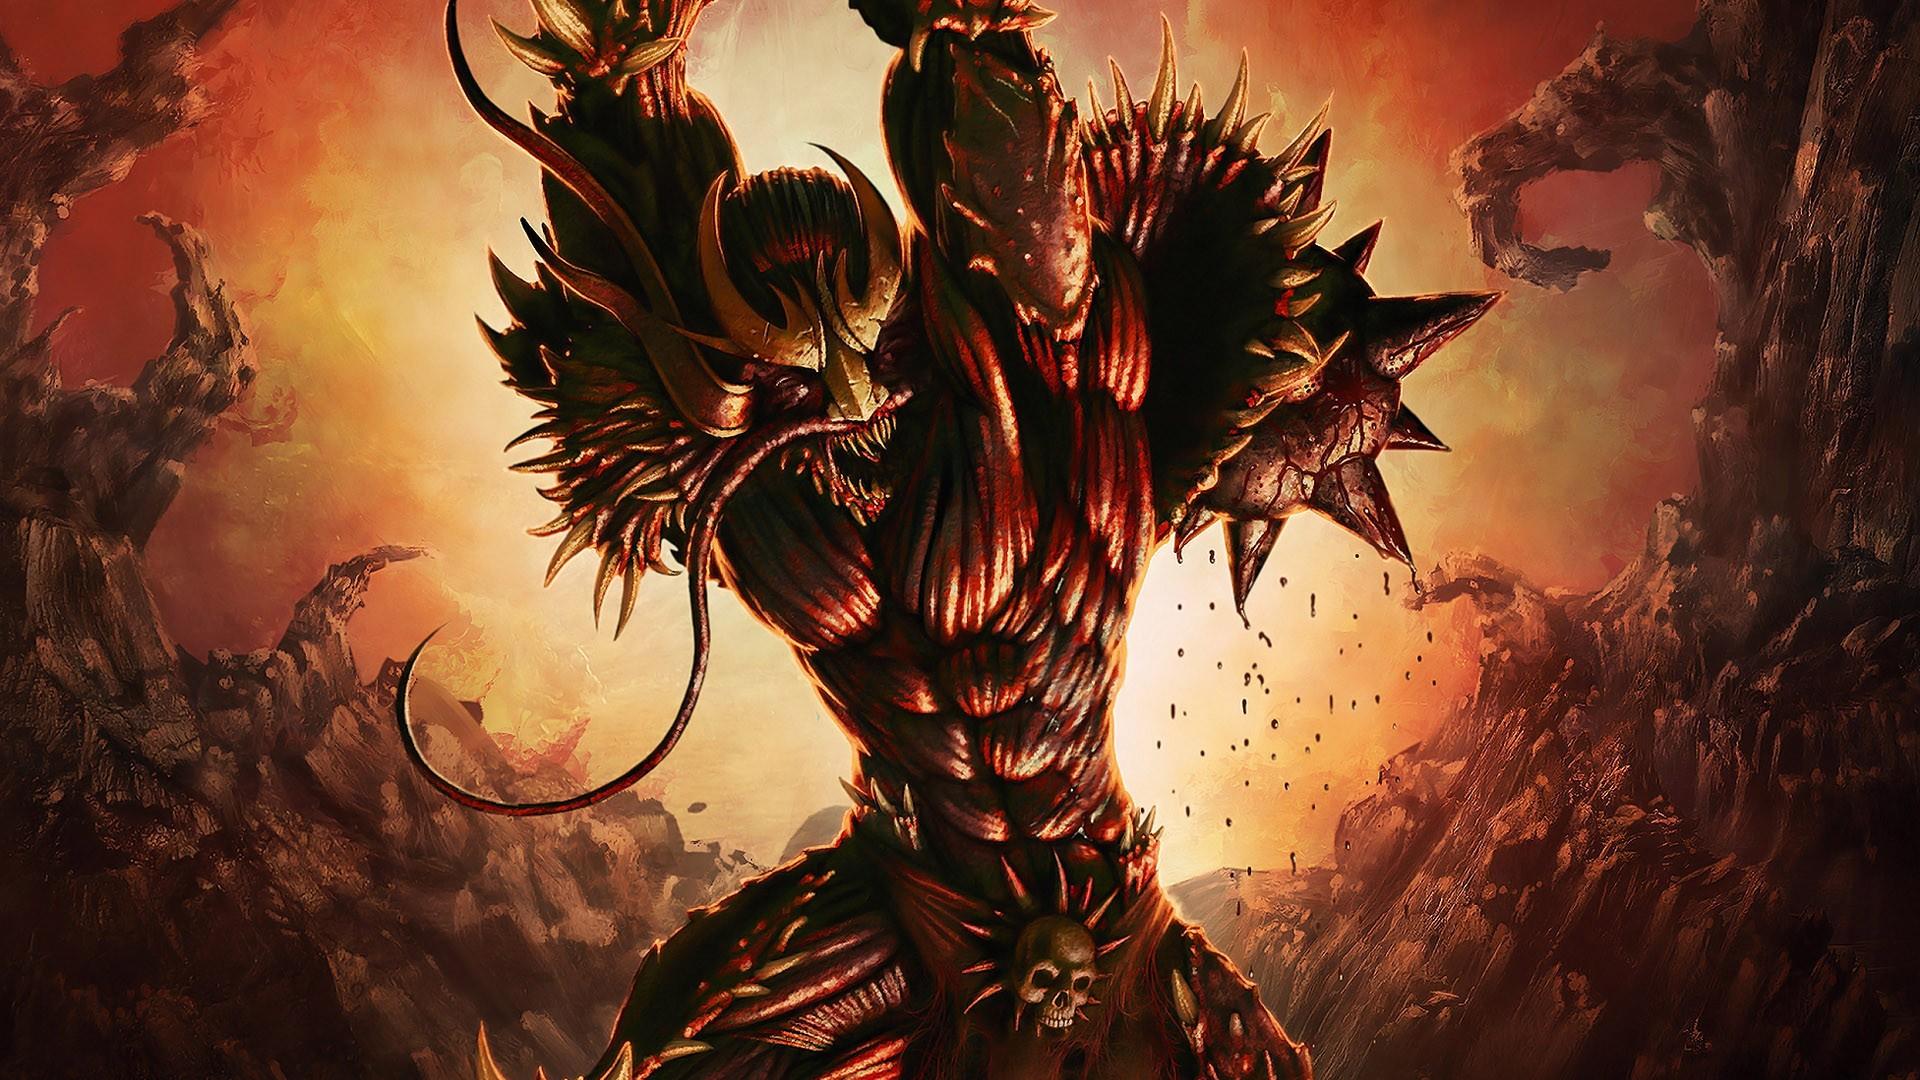 Demon Monster Wallpapers Spiky Demon Monster Myspace Backgrounds 1920x1080